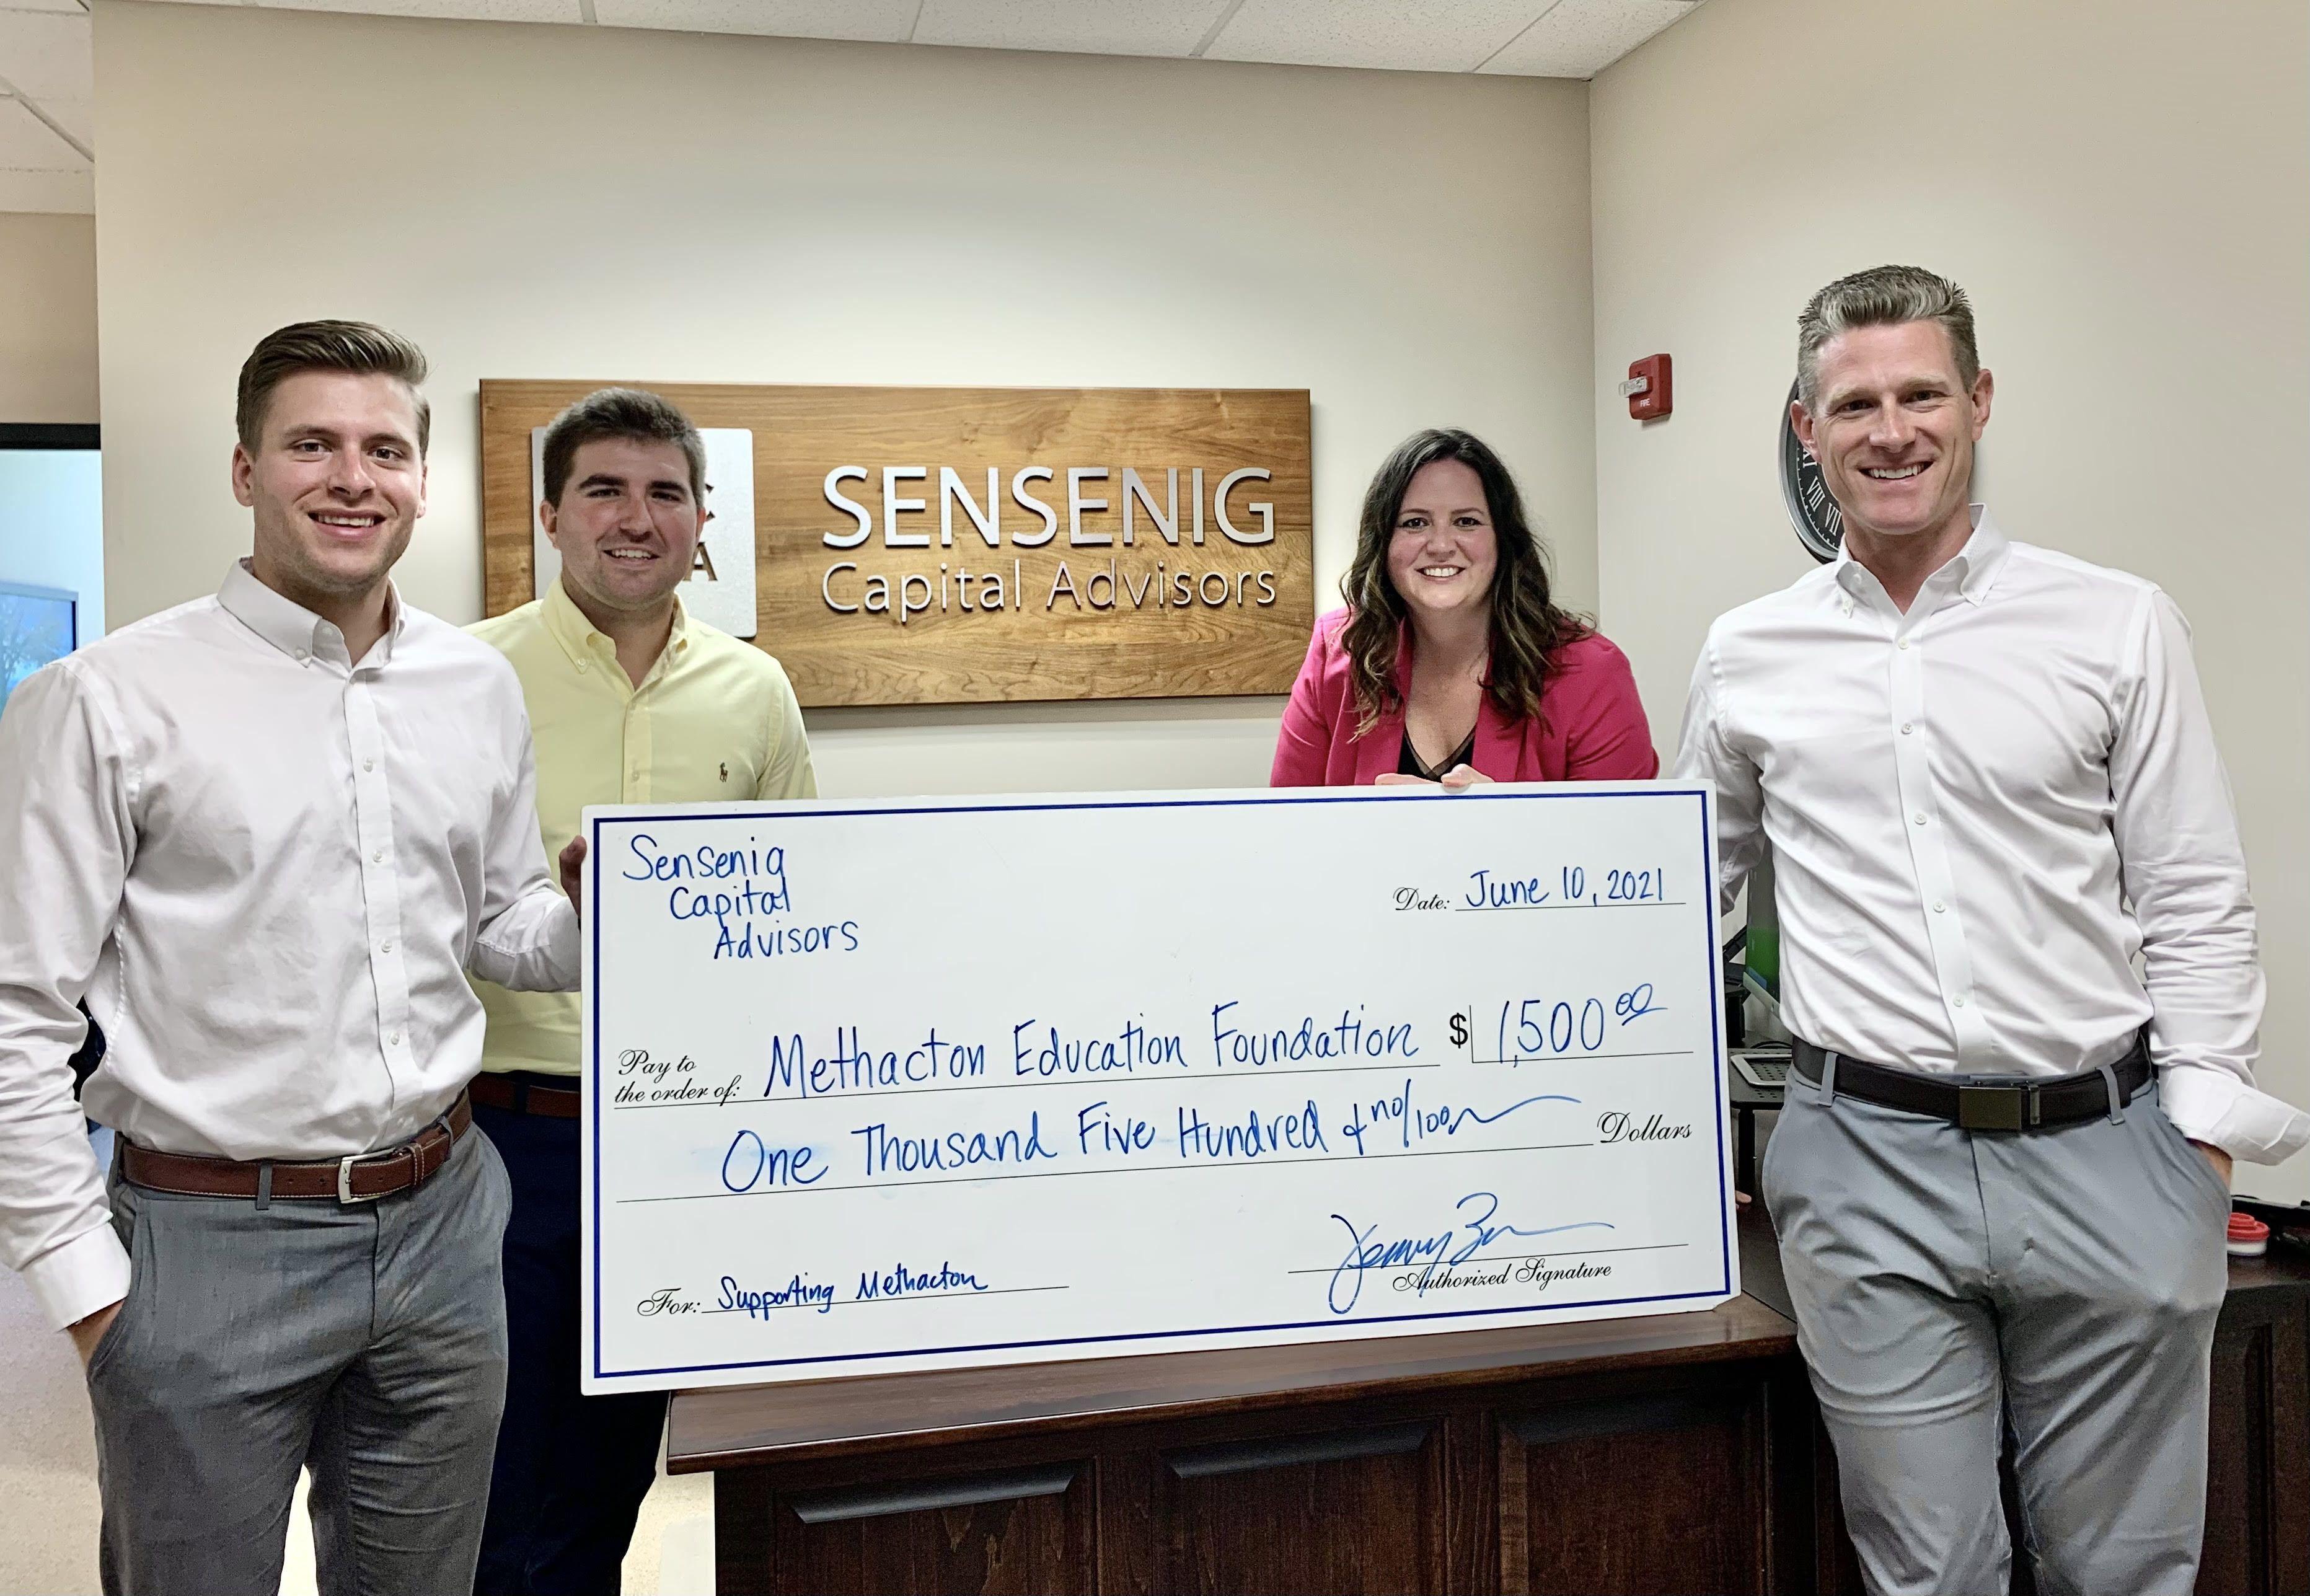 Sensenig Capital Advisors Donates $1,500 to Support Methacton Educational Programs